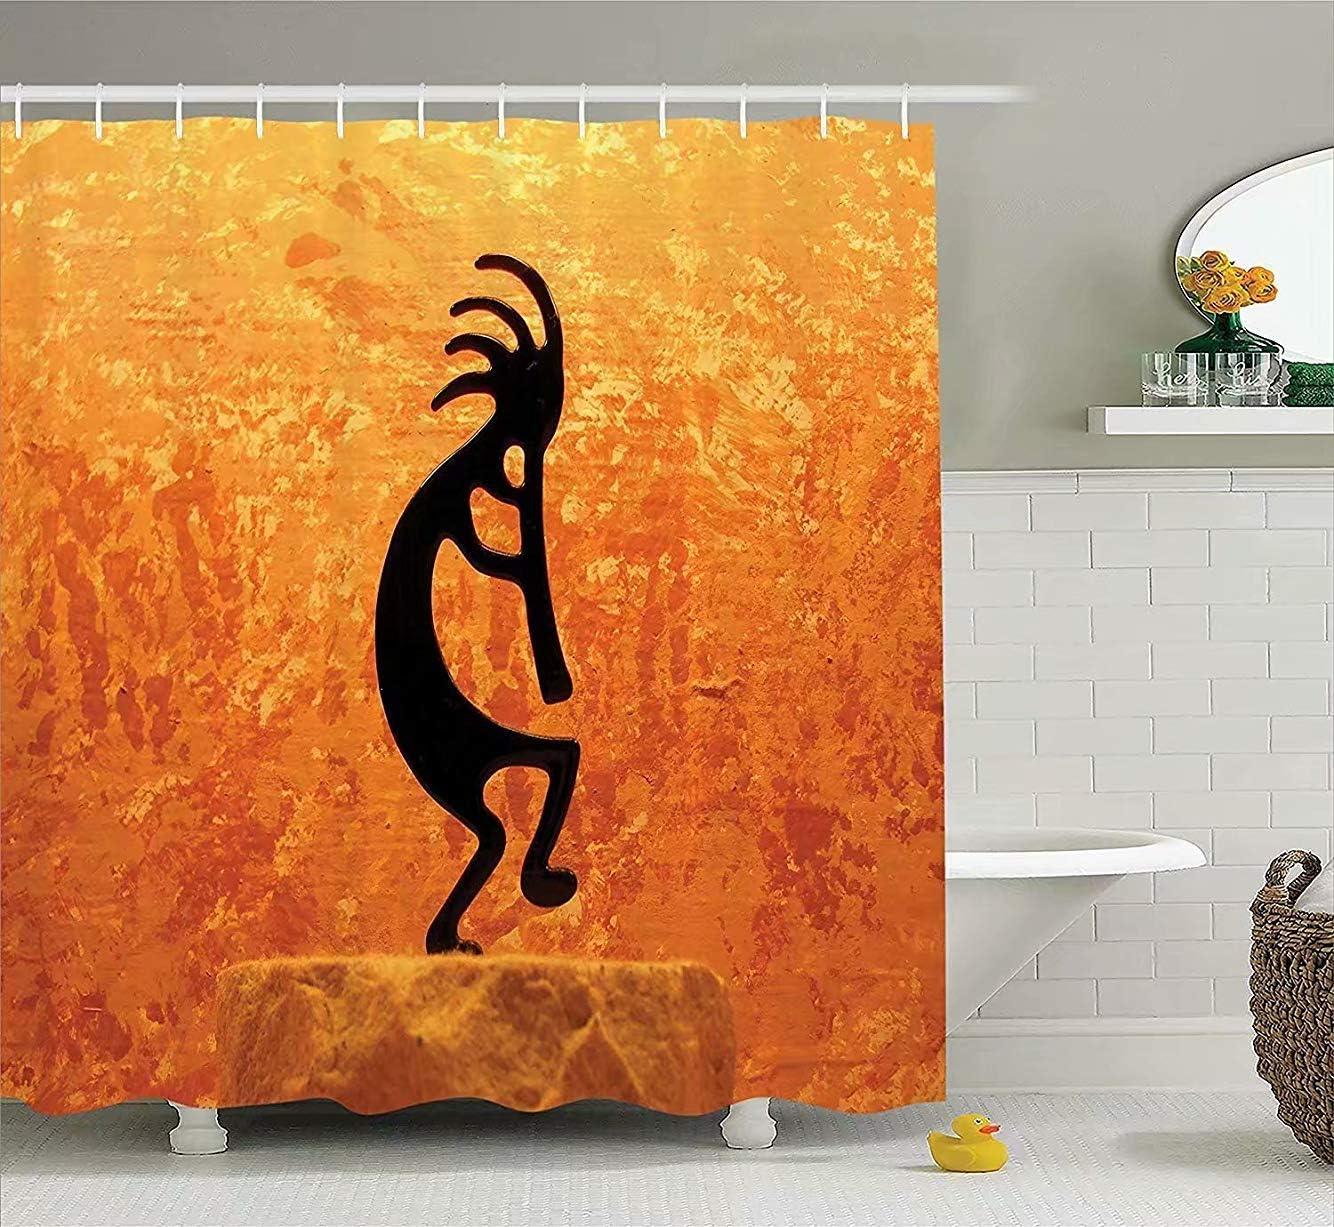 AshasdS Shower Curtains,Kokopelli Decor,Southwestern Style,Orange  Black,Shower Curtain Clear,Waterproof Fabric Bathroom Decor with Hooks,  Bathroom